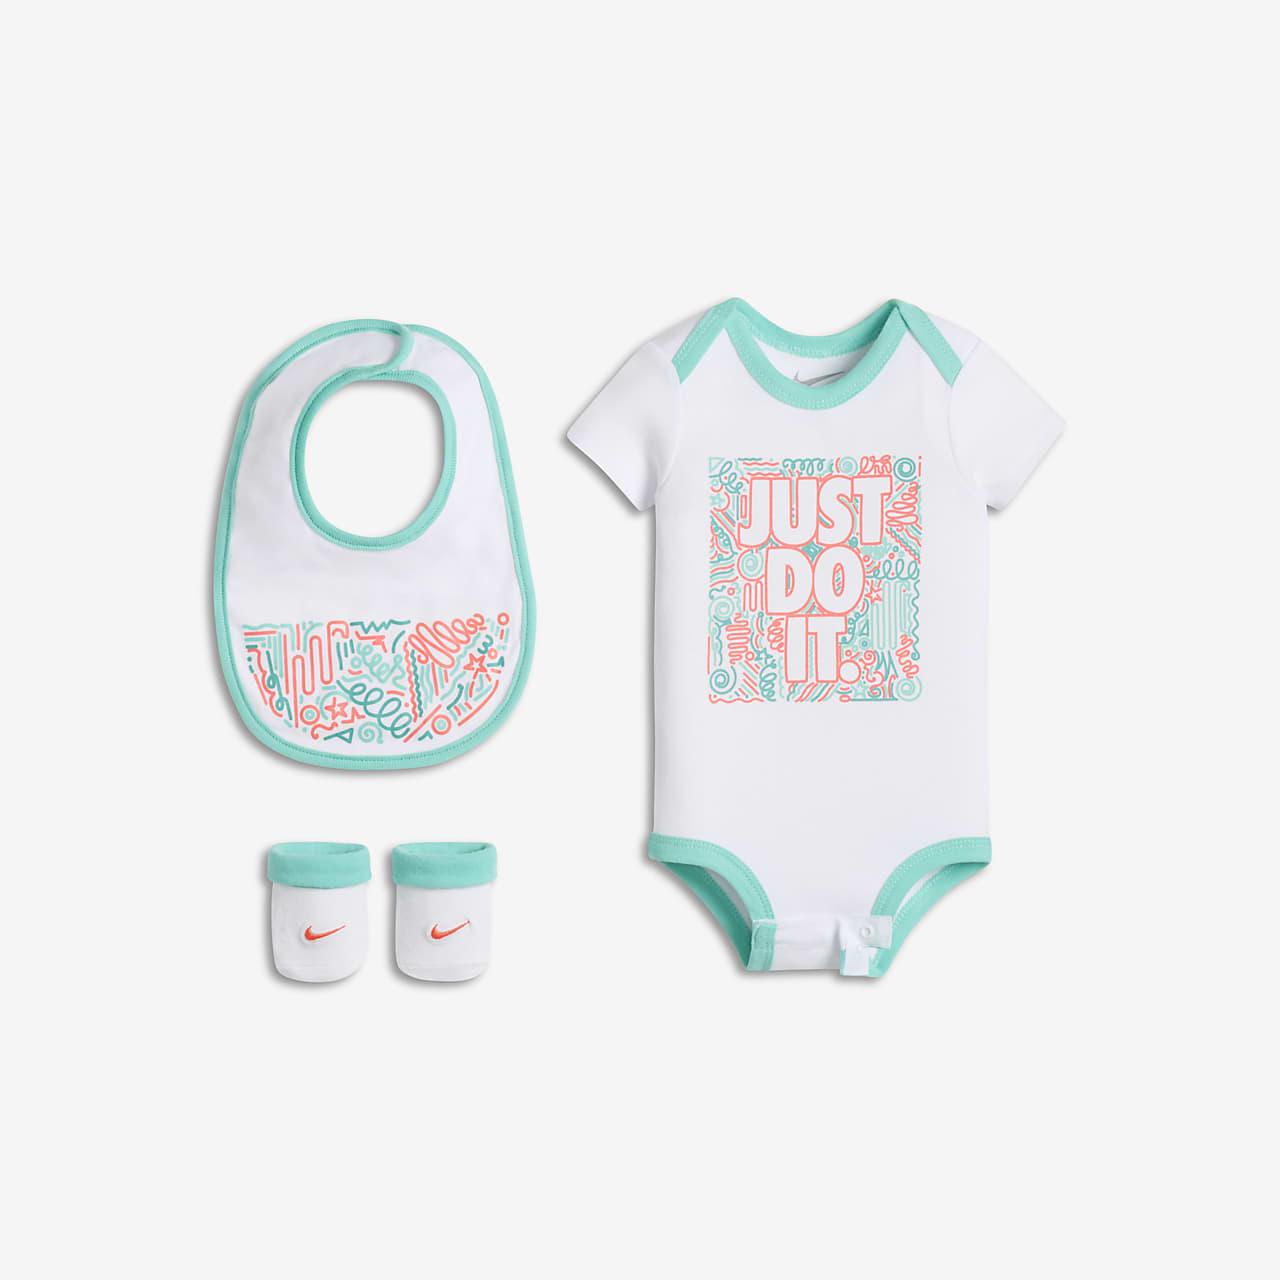 Nike Swoosh Squiggle Three-Piece Babyset